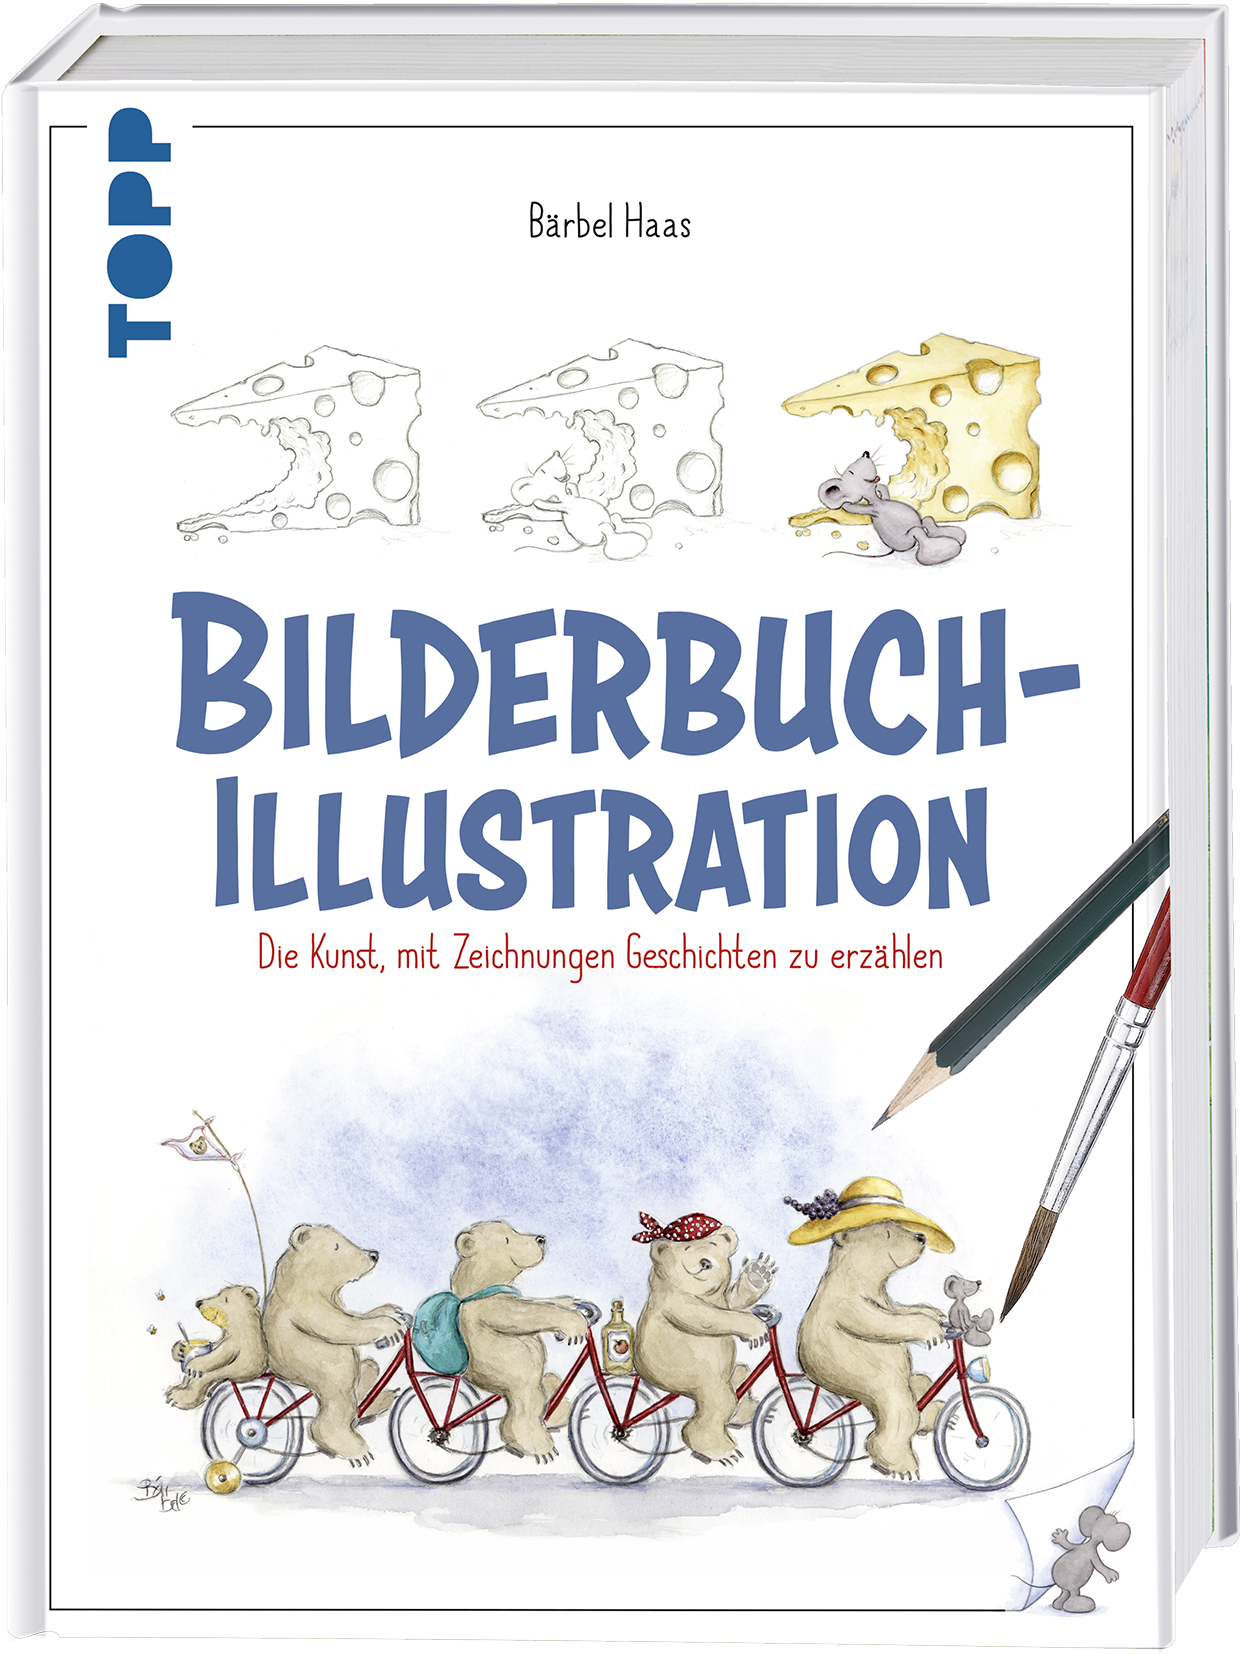 Bilderbuch Illustration | Bilderbuch, Bücher, Illustration